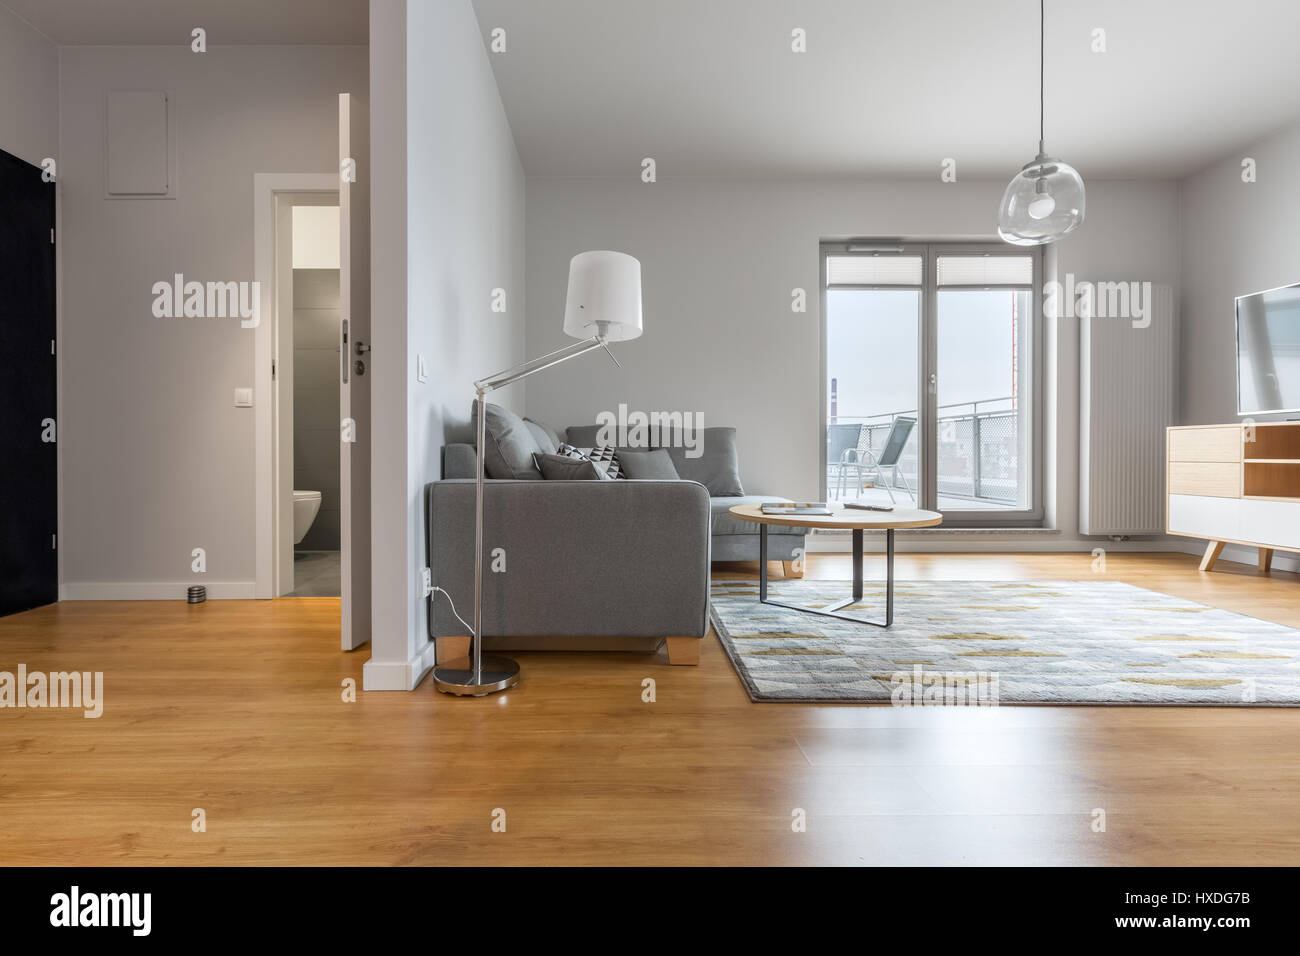 Modern living room with big hallway and bathroom doors open - Stock Image